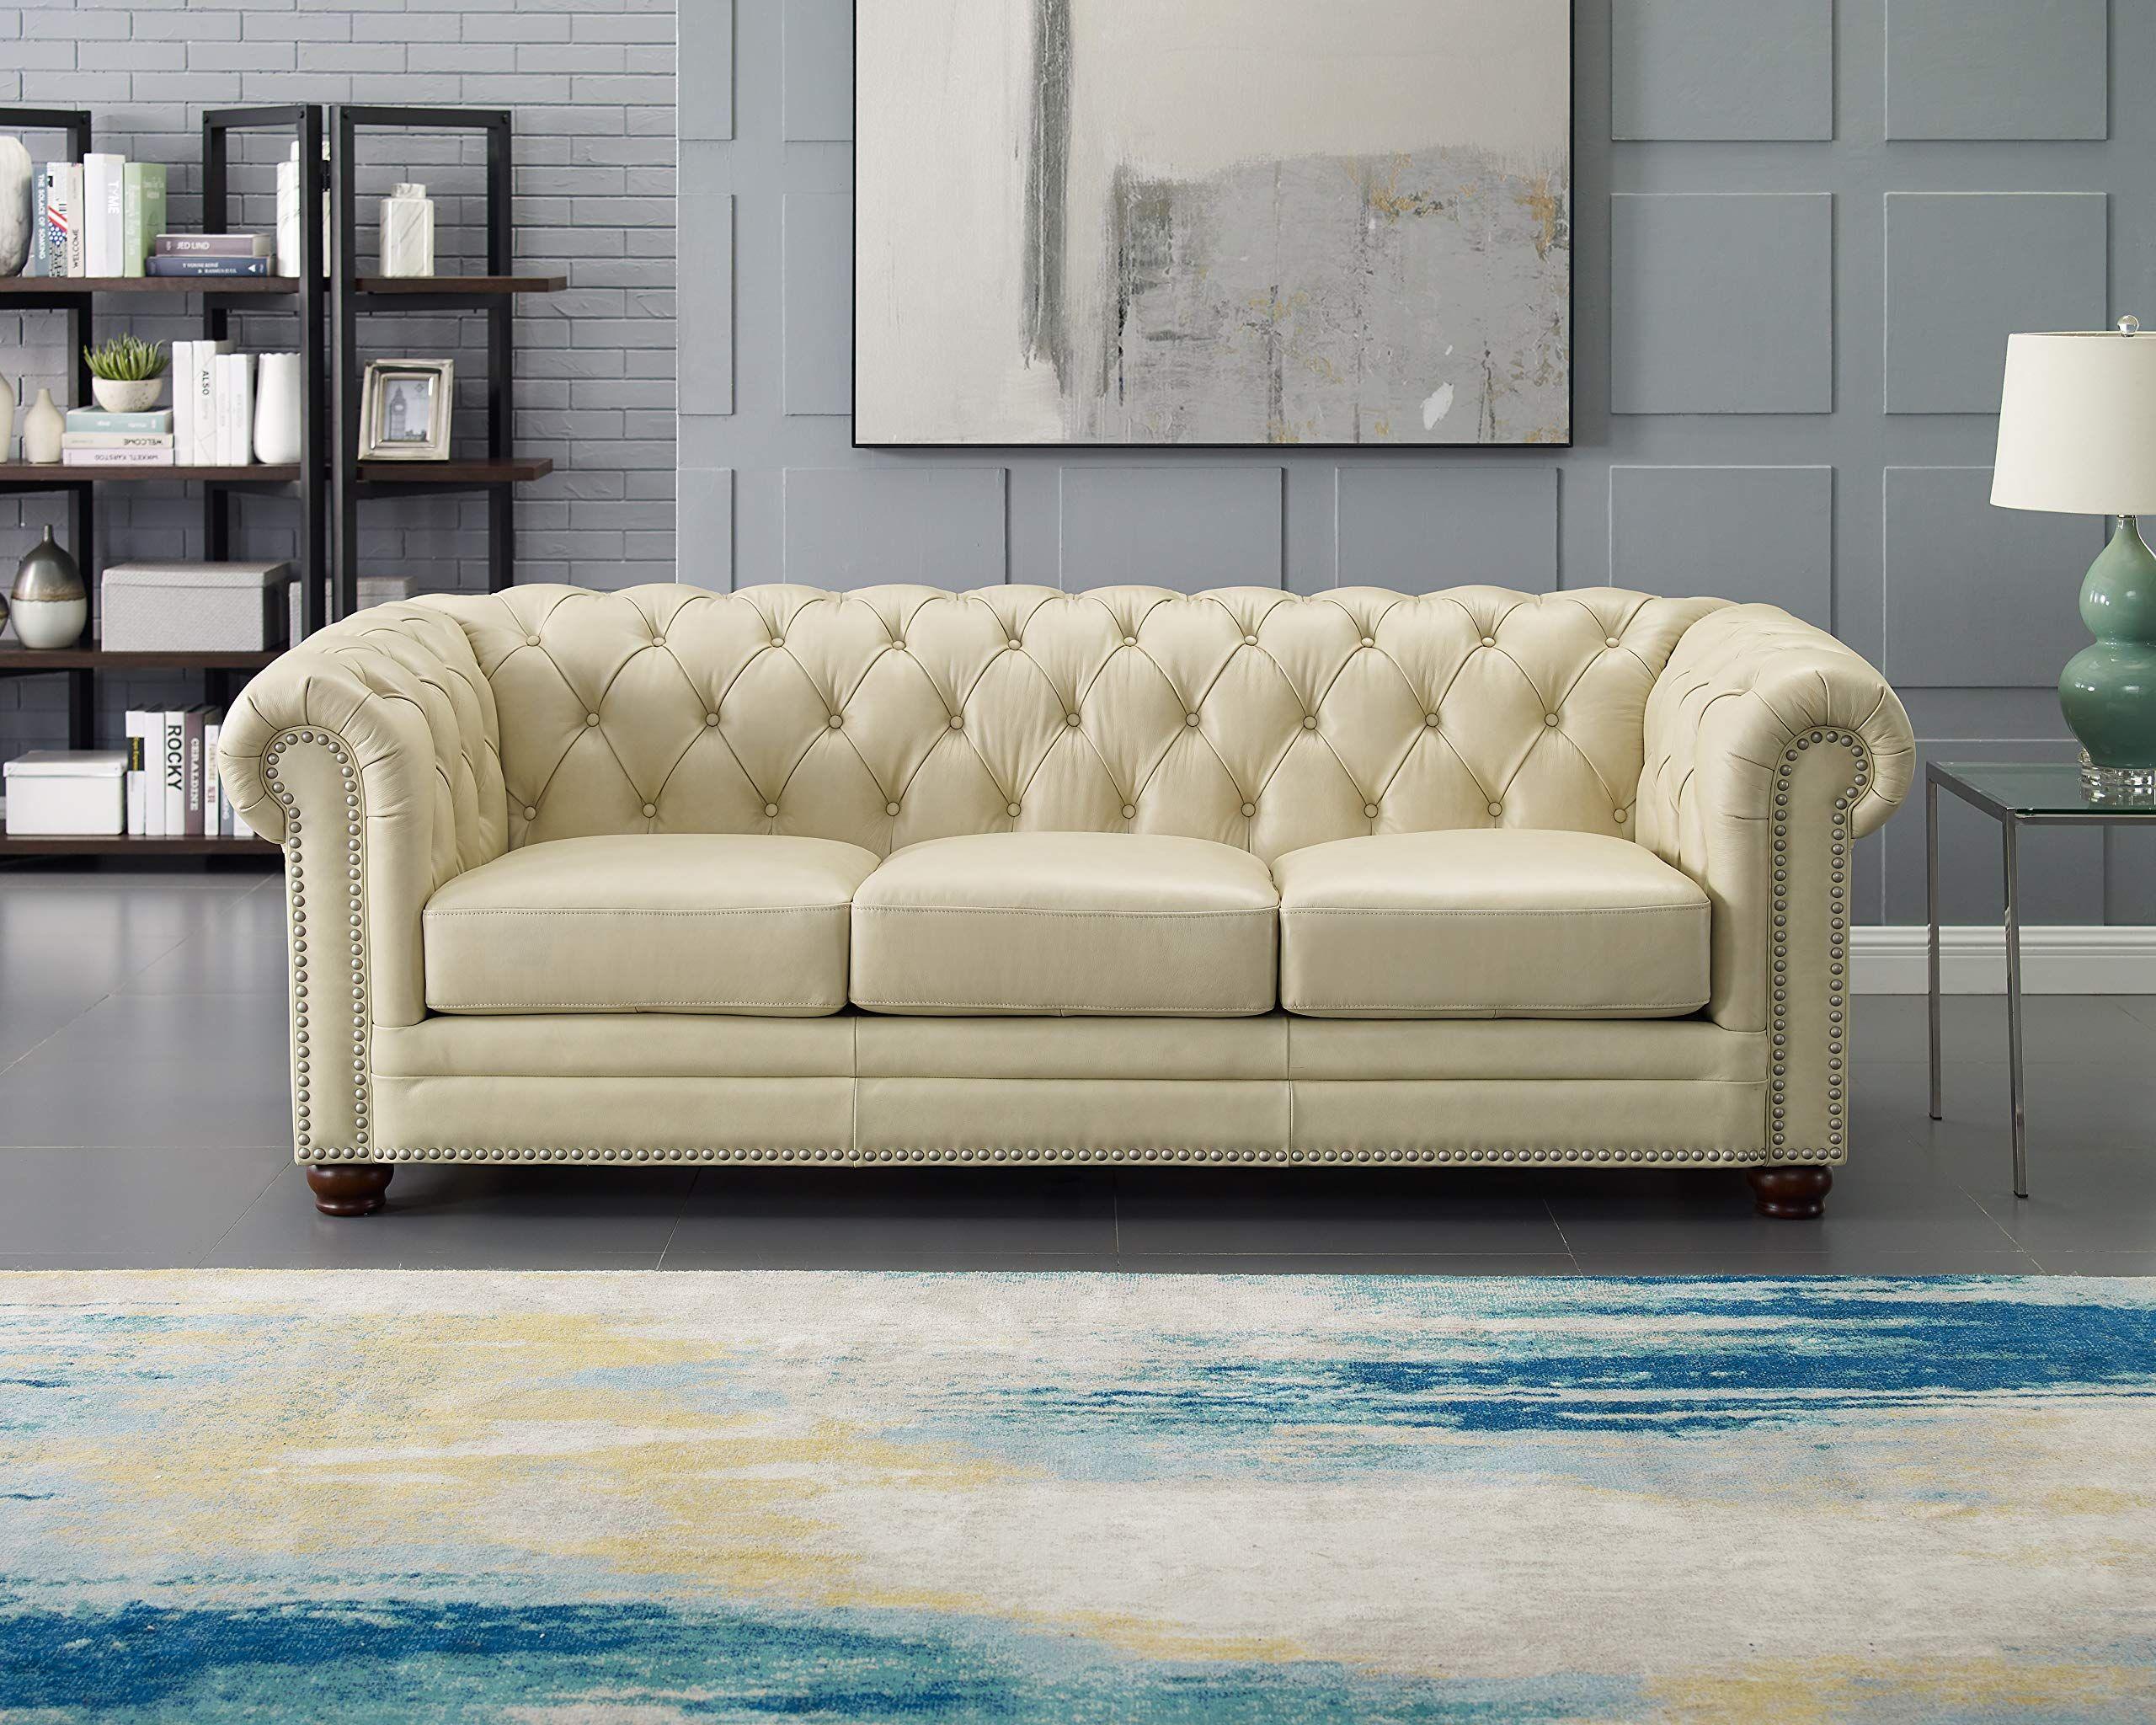 Hydeline Aliso 100 Leather Sofa Set Sofa Ivory In 2020 Leather Sofa Living Room Leather Sofa Couch Sofa